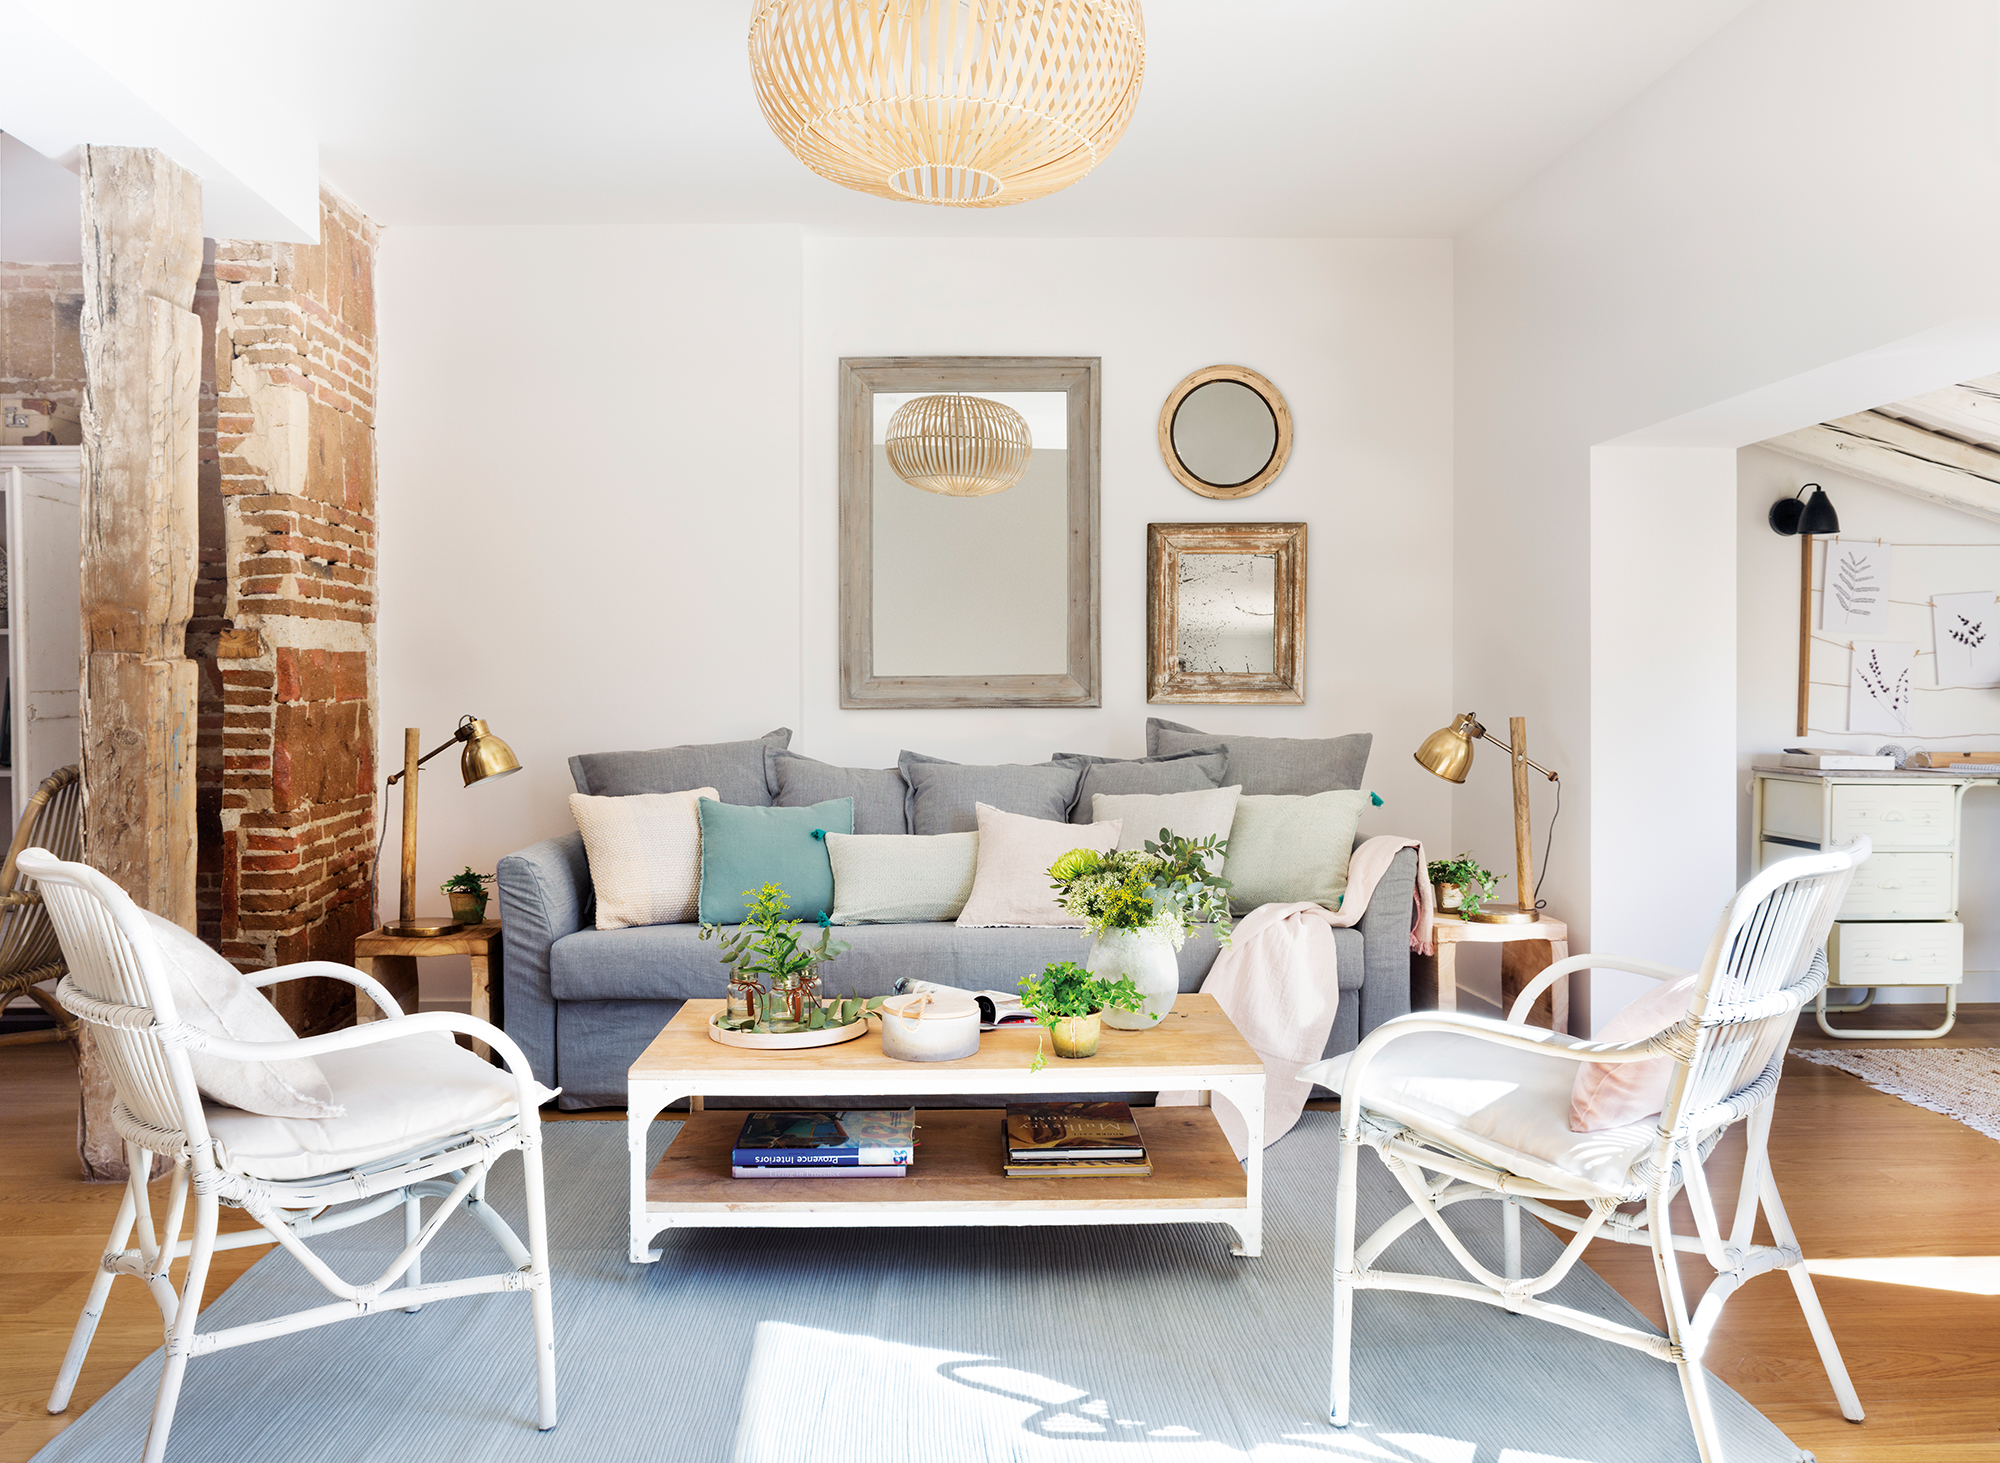 Sof claves para elegirlo - Salon sofa gris ...